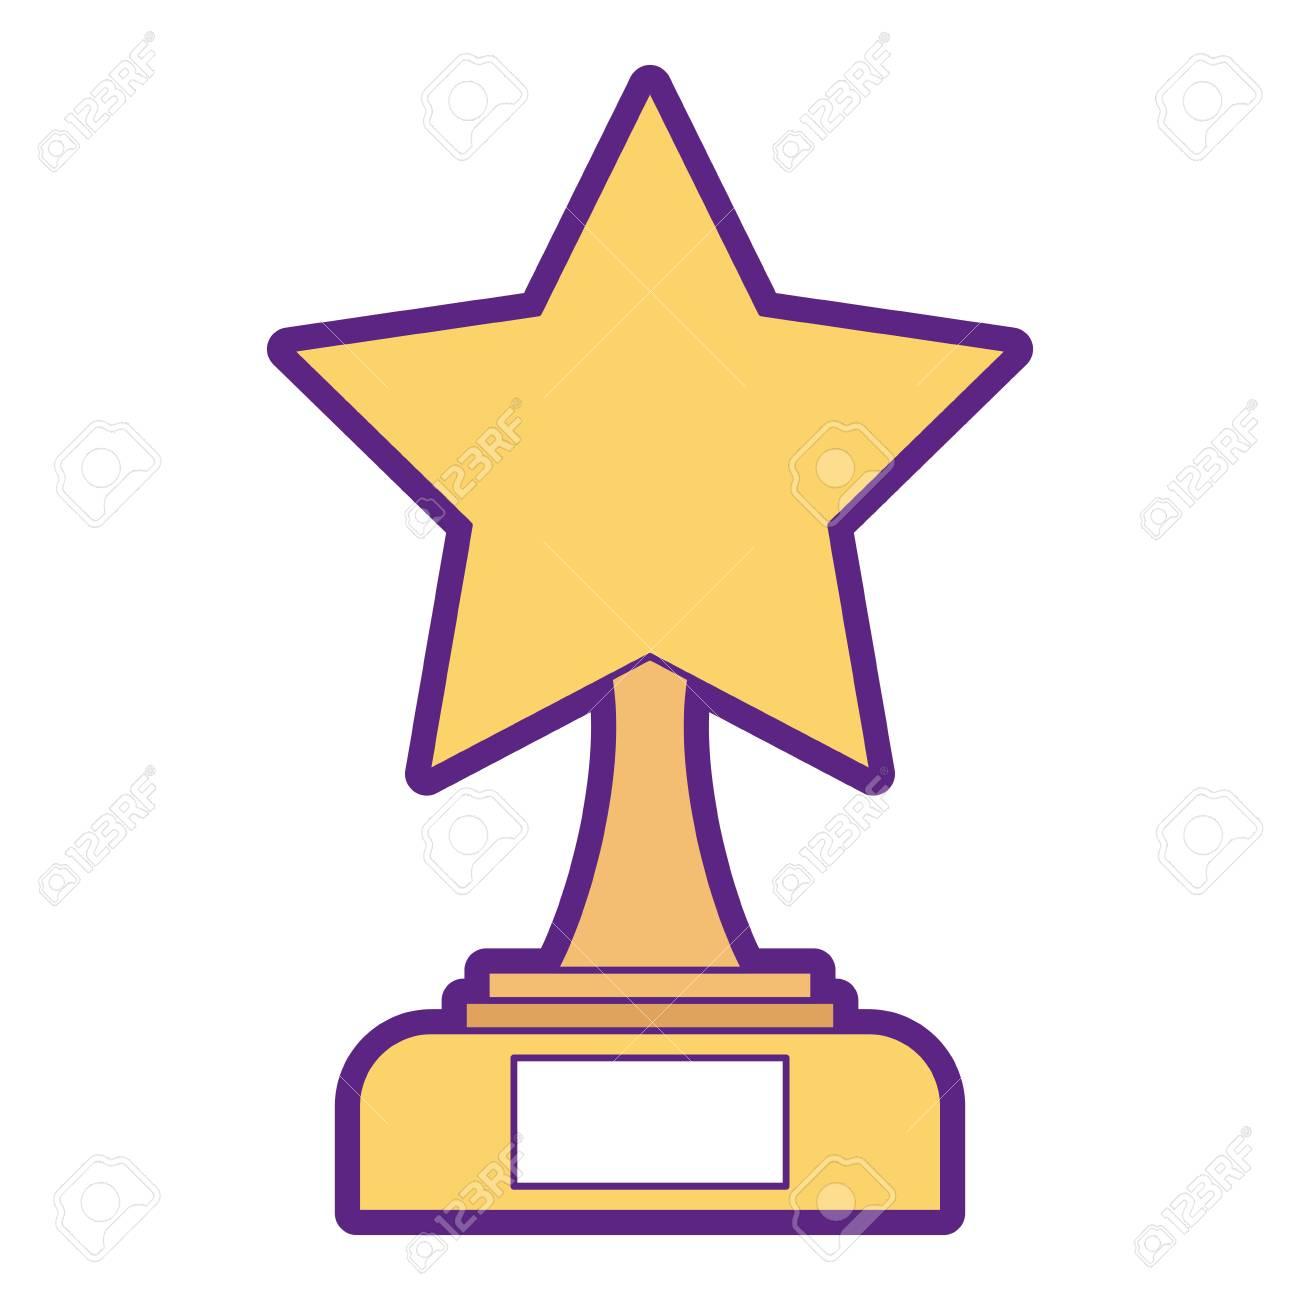 hight resolution of star trophy winner icon illustration design stock vector 91870337